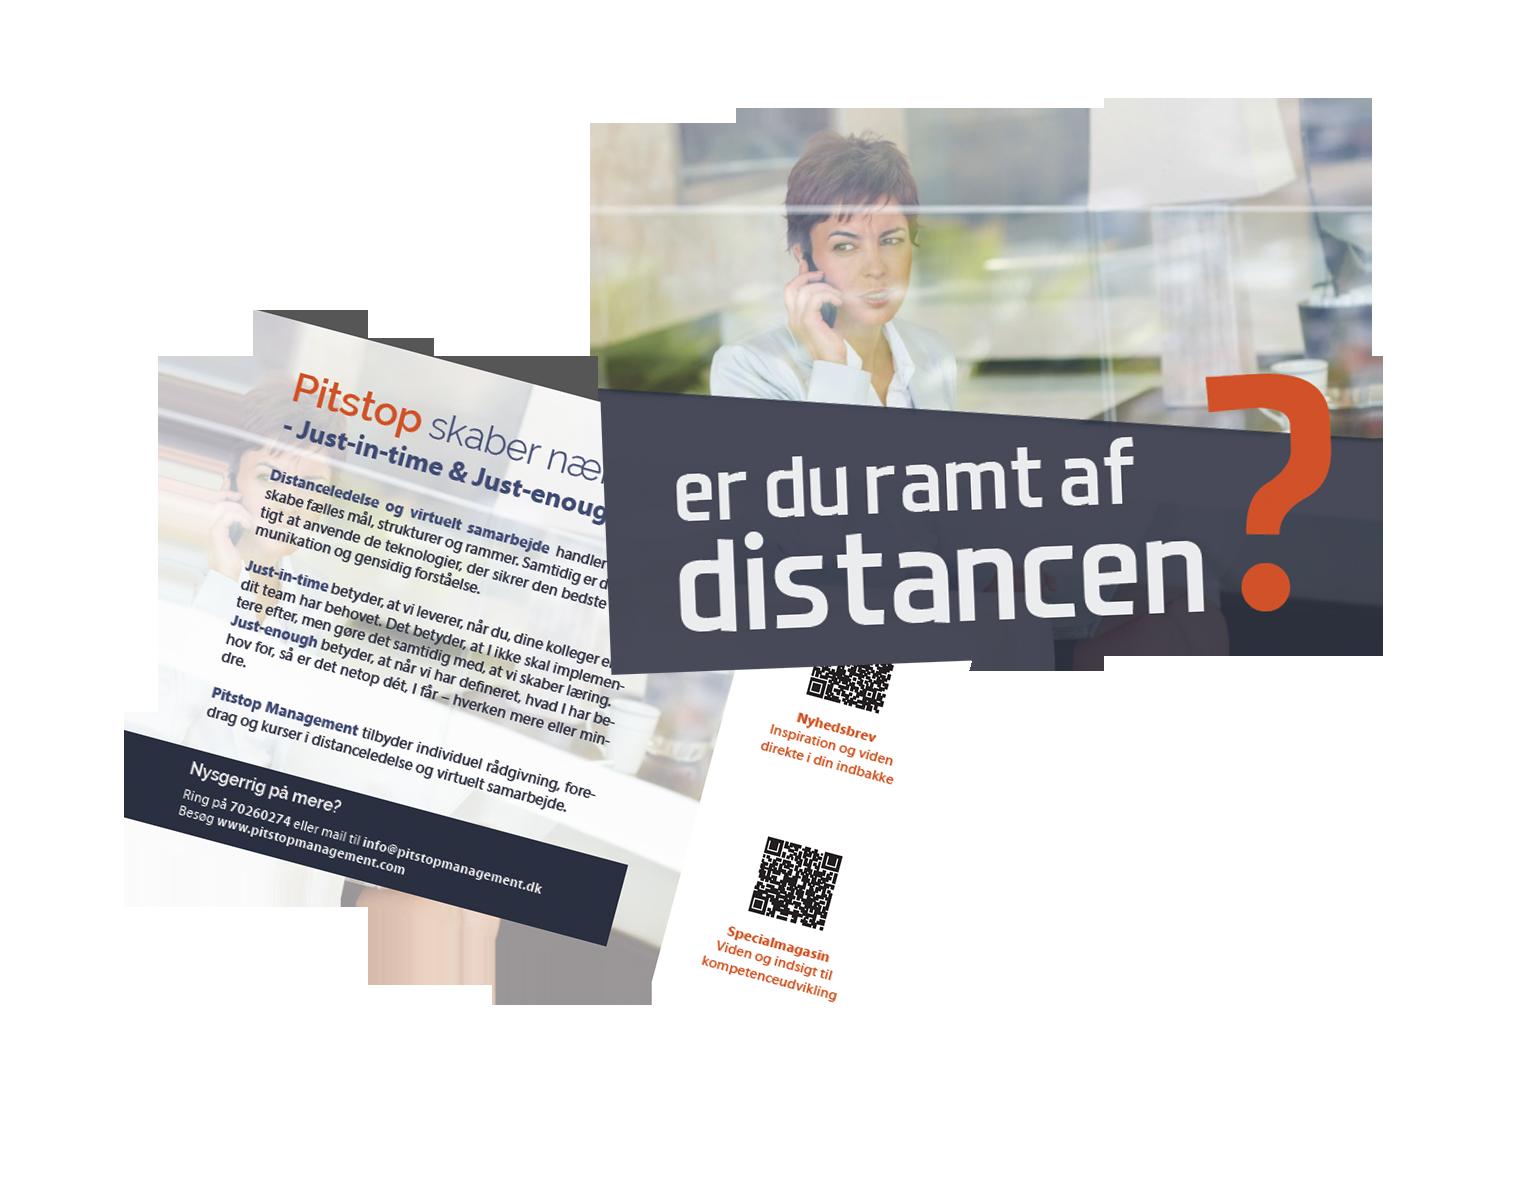 Postkort for Pitstop Management